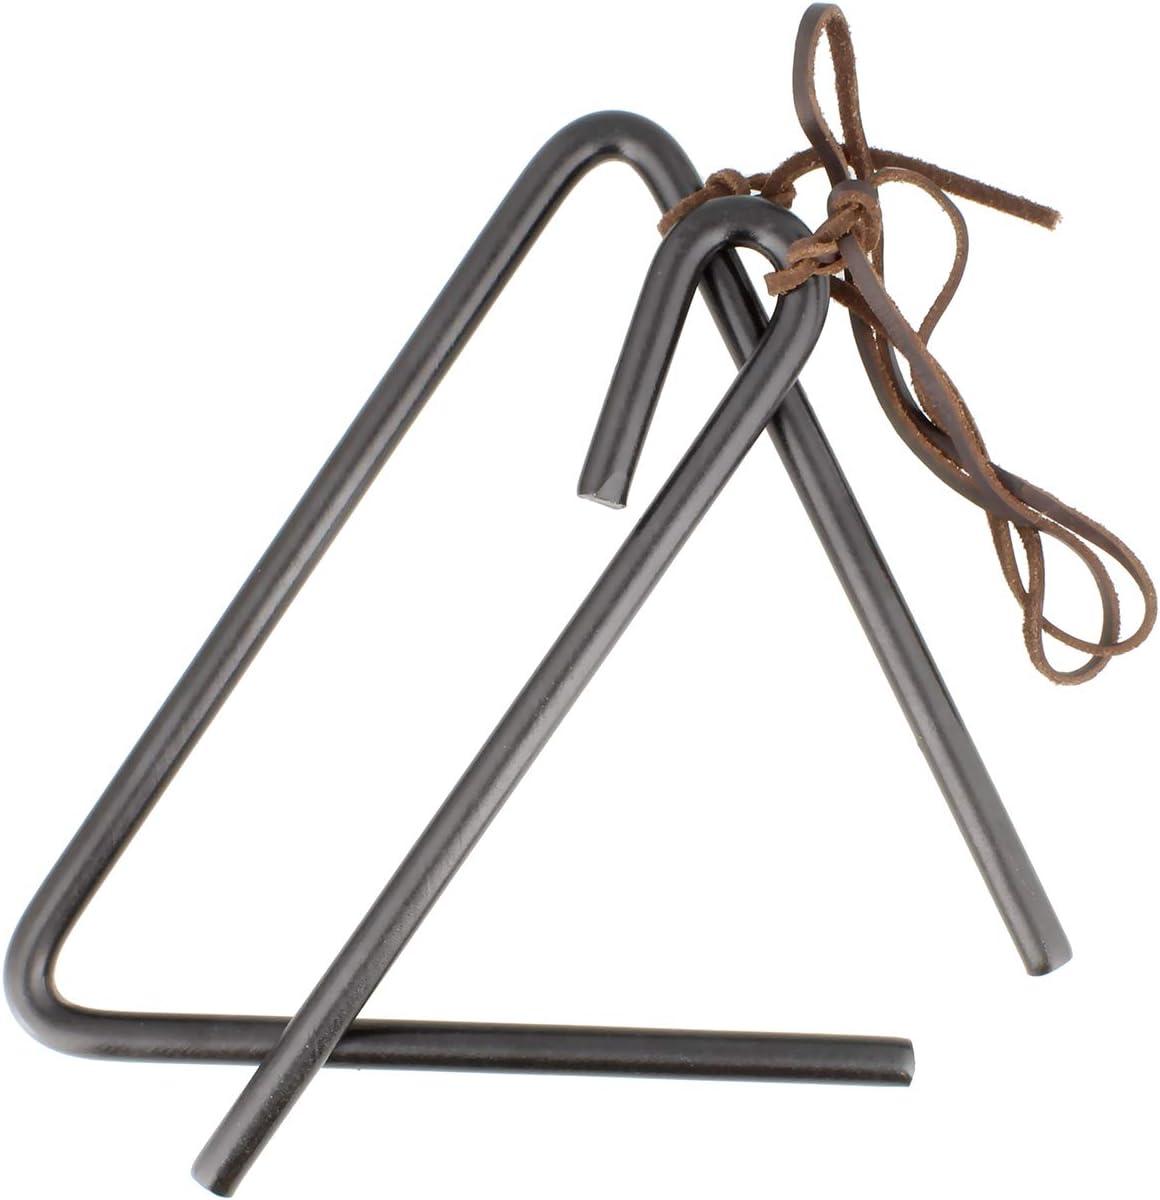 Redneck Convent Triangle Call Bell – Outdoor Bell Ringer Triangle Dinner Bell, Dinner Triangle, Farmhouse Bell – Chuckwagon Dinner Bell